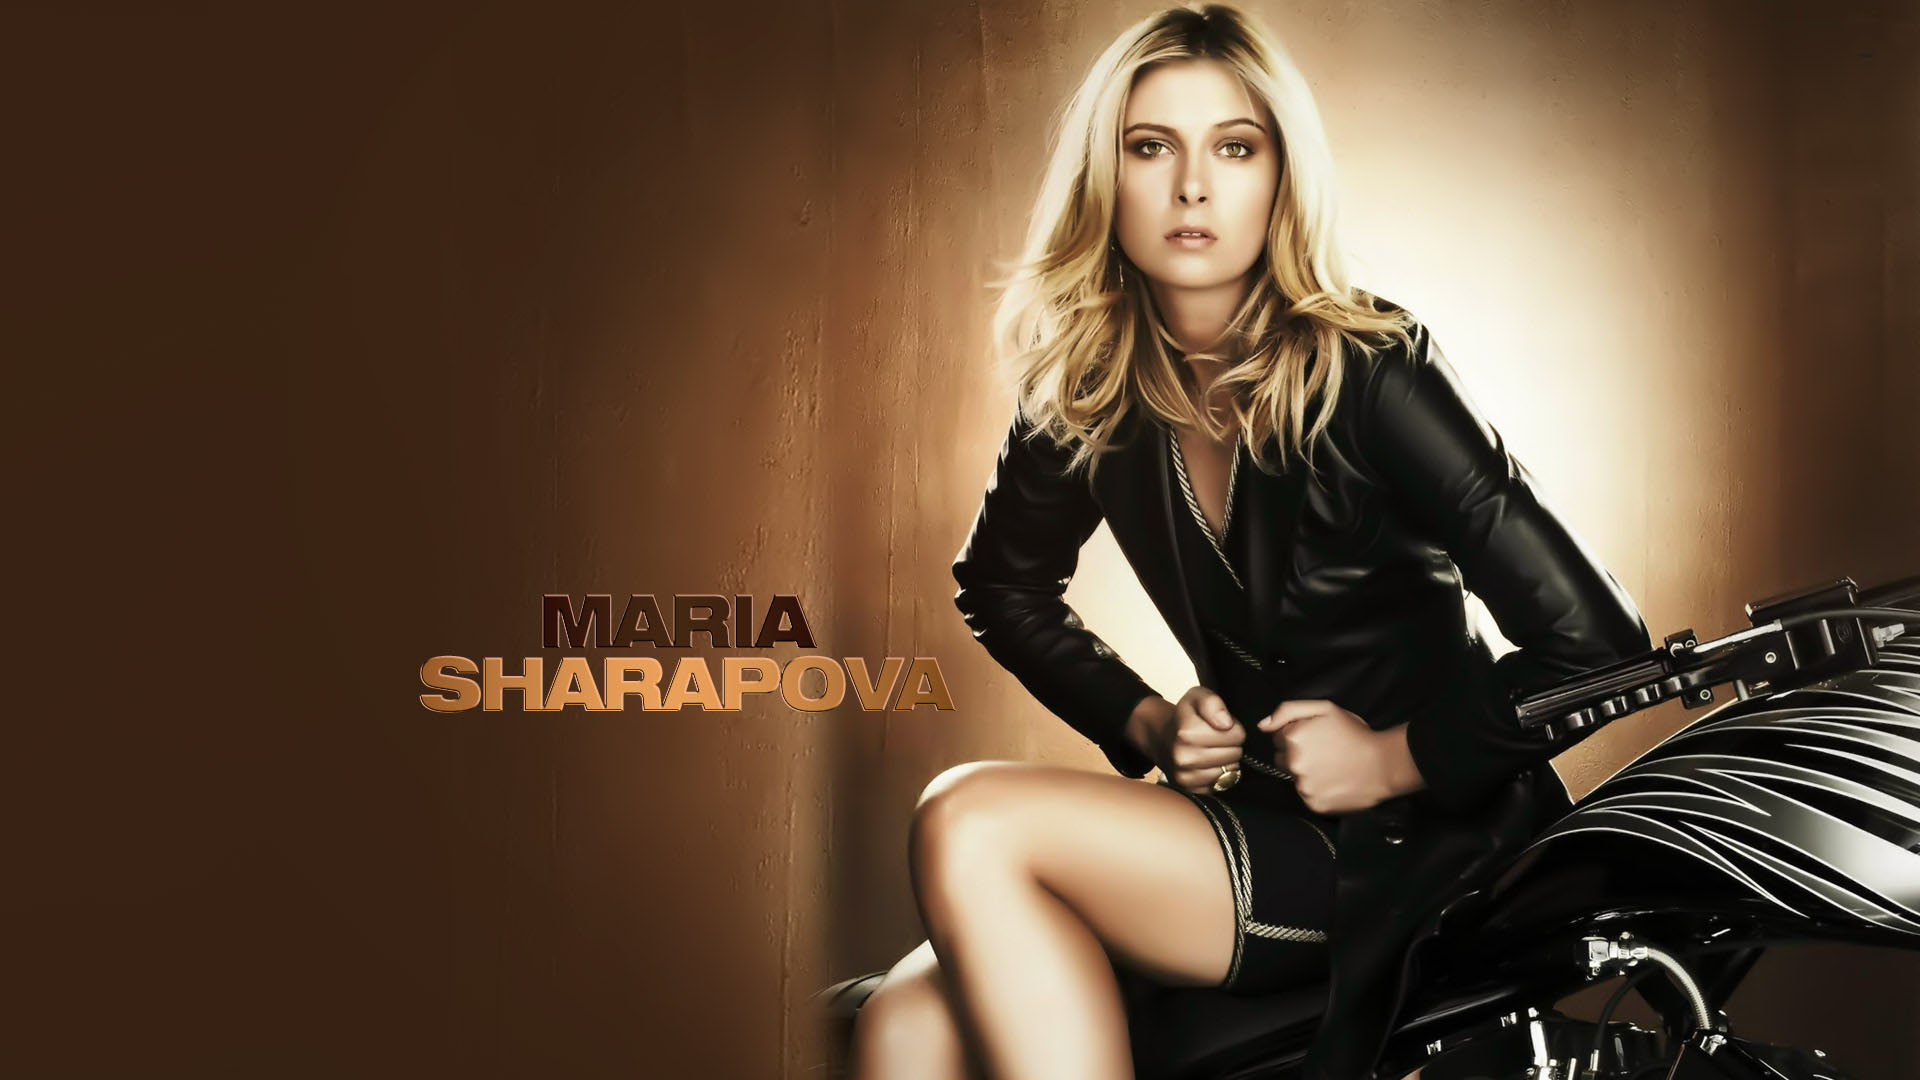 Maria Sharapova Wallpaper #44